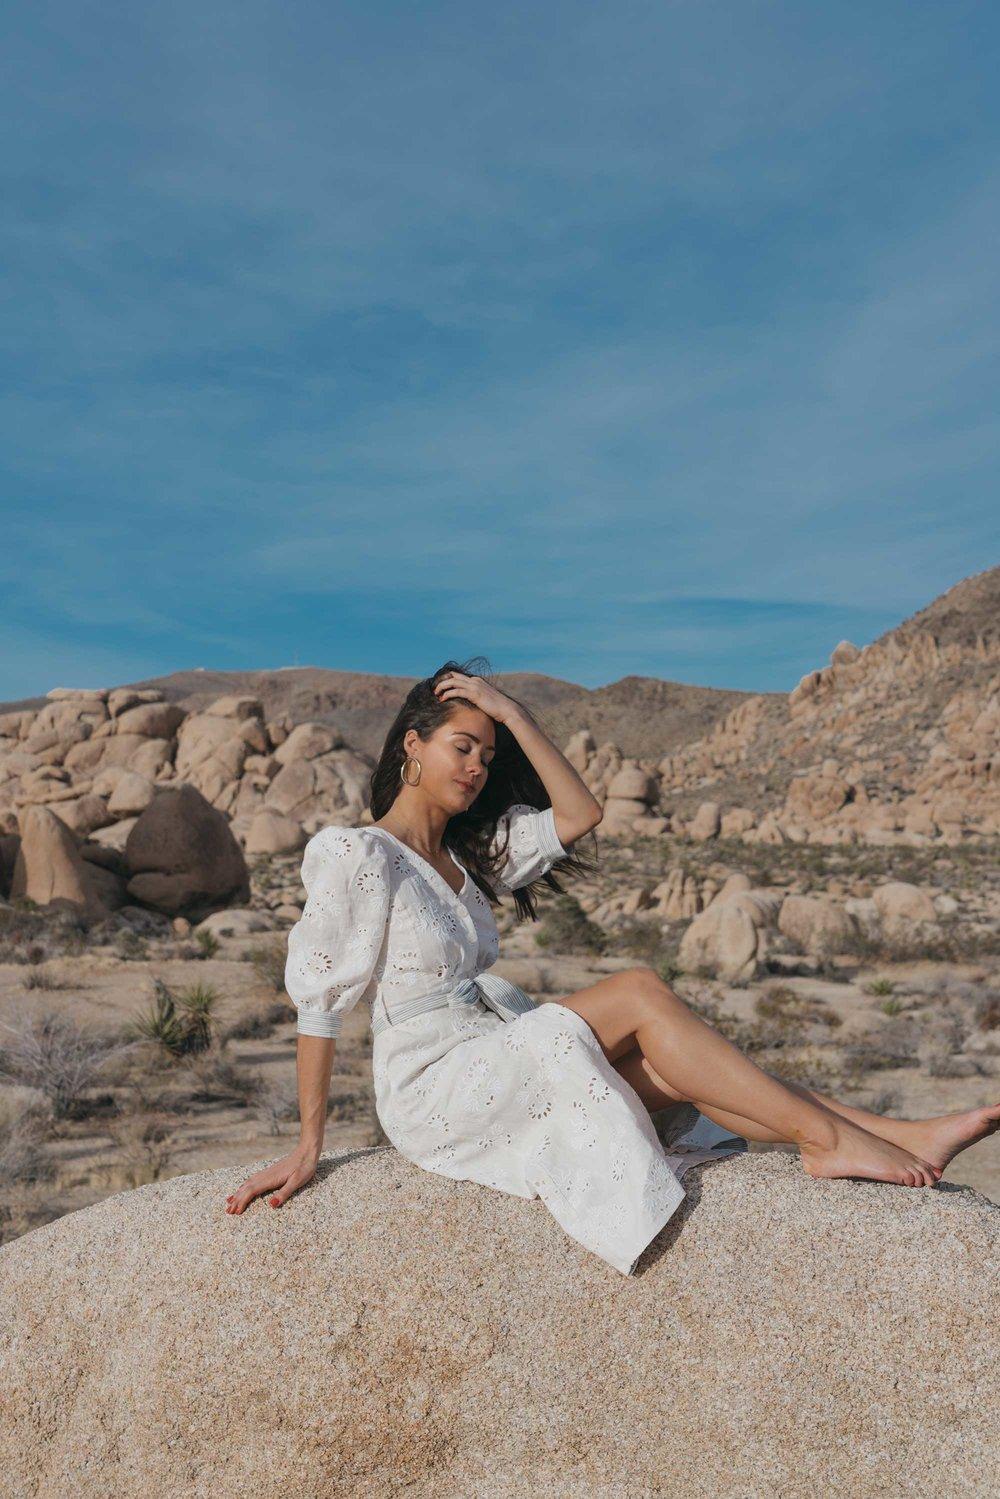 Rebecca-Taylor-vintage-inspired-eyelet-dress-Joshua-Tree-Festival-Outfit--23.jpg